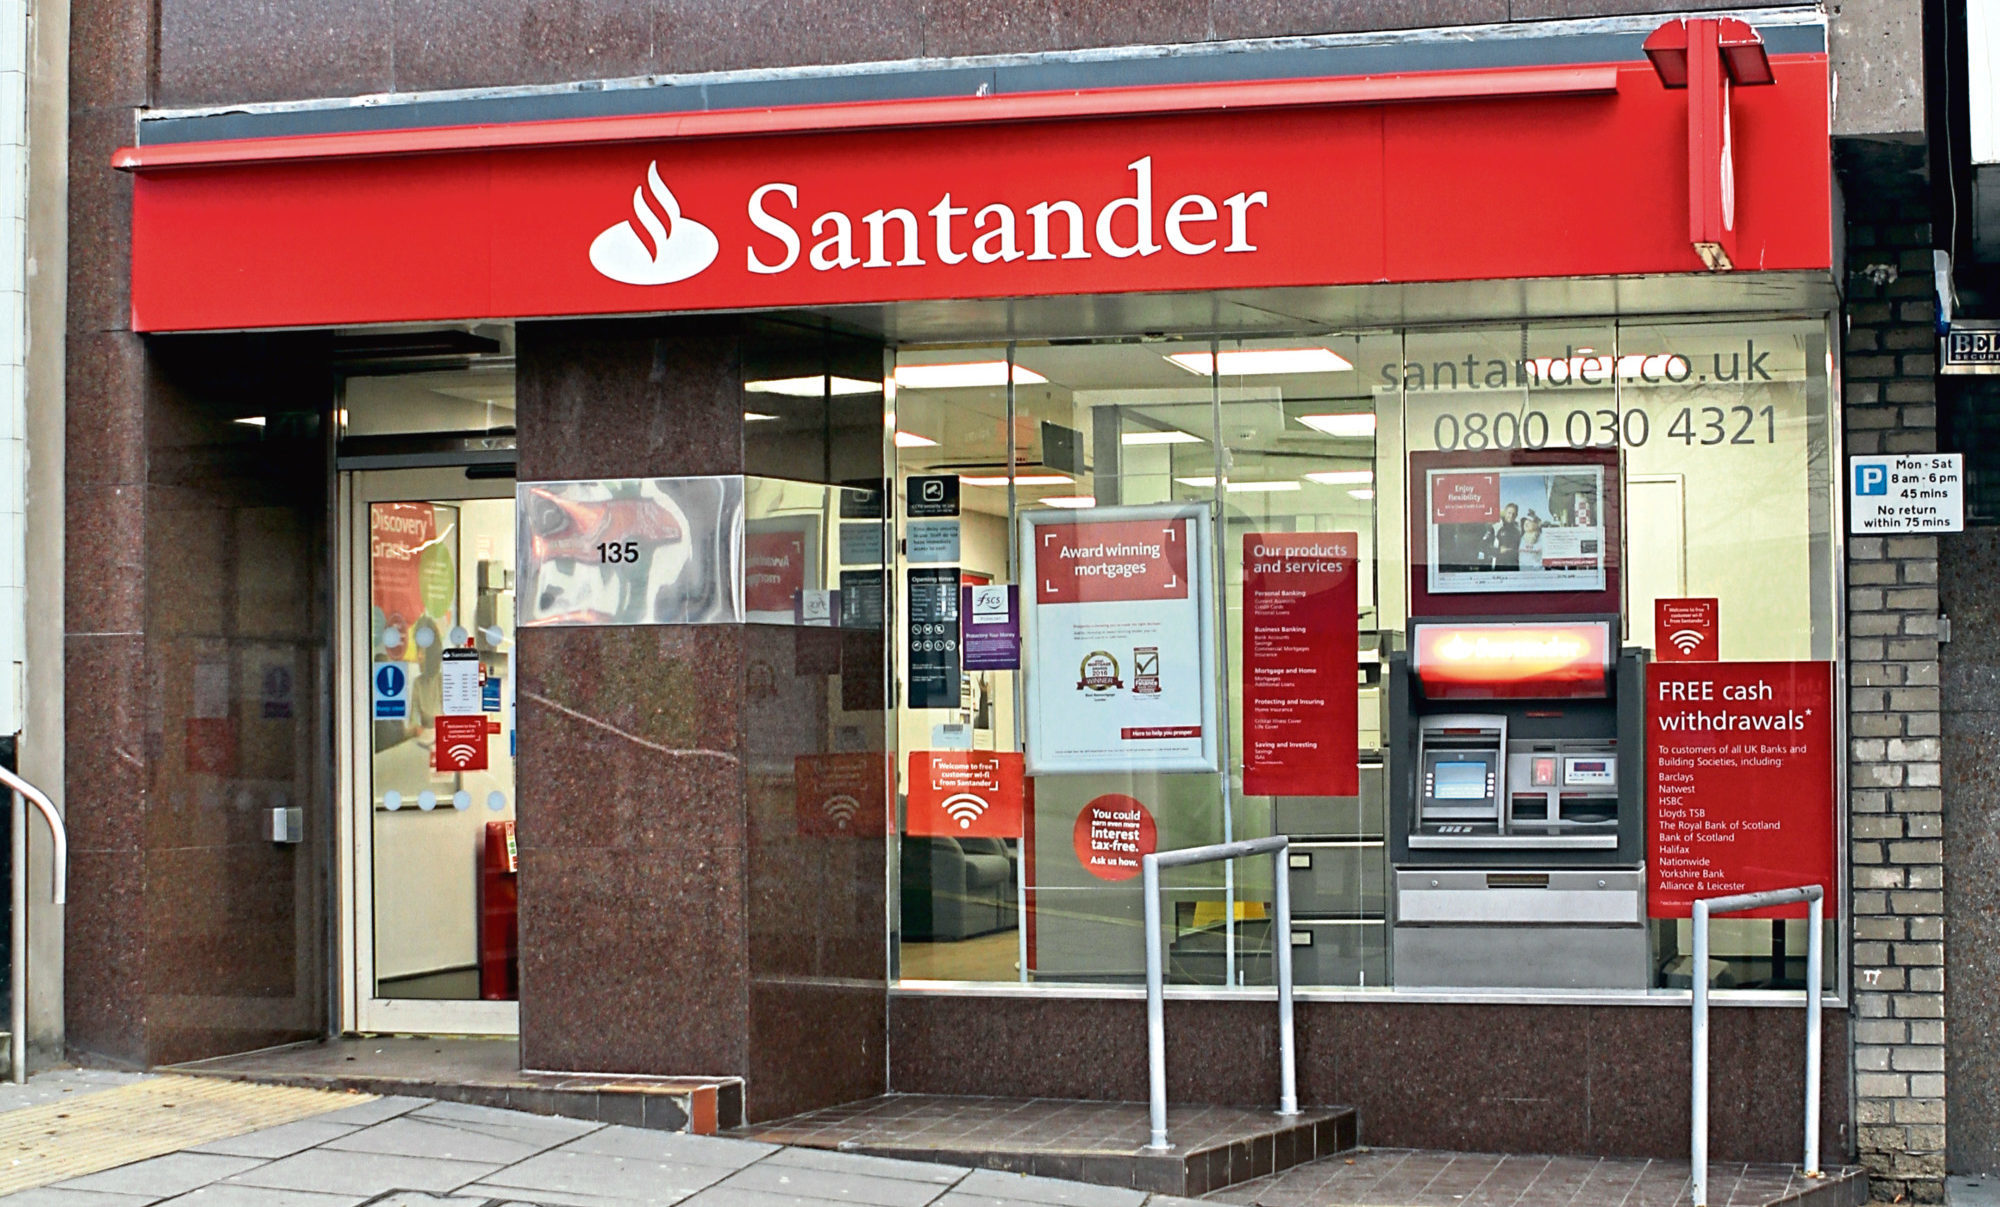 The Santander bank on Lochee High Street